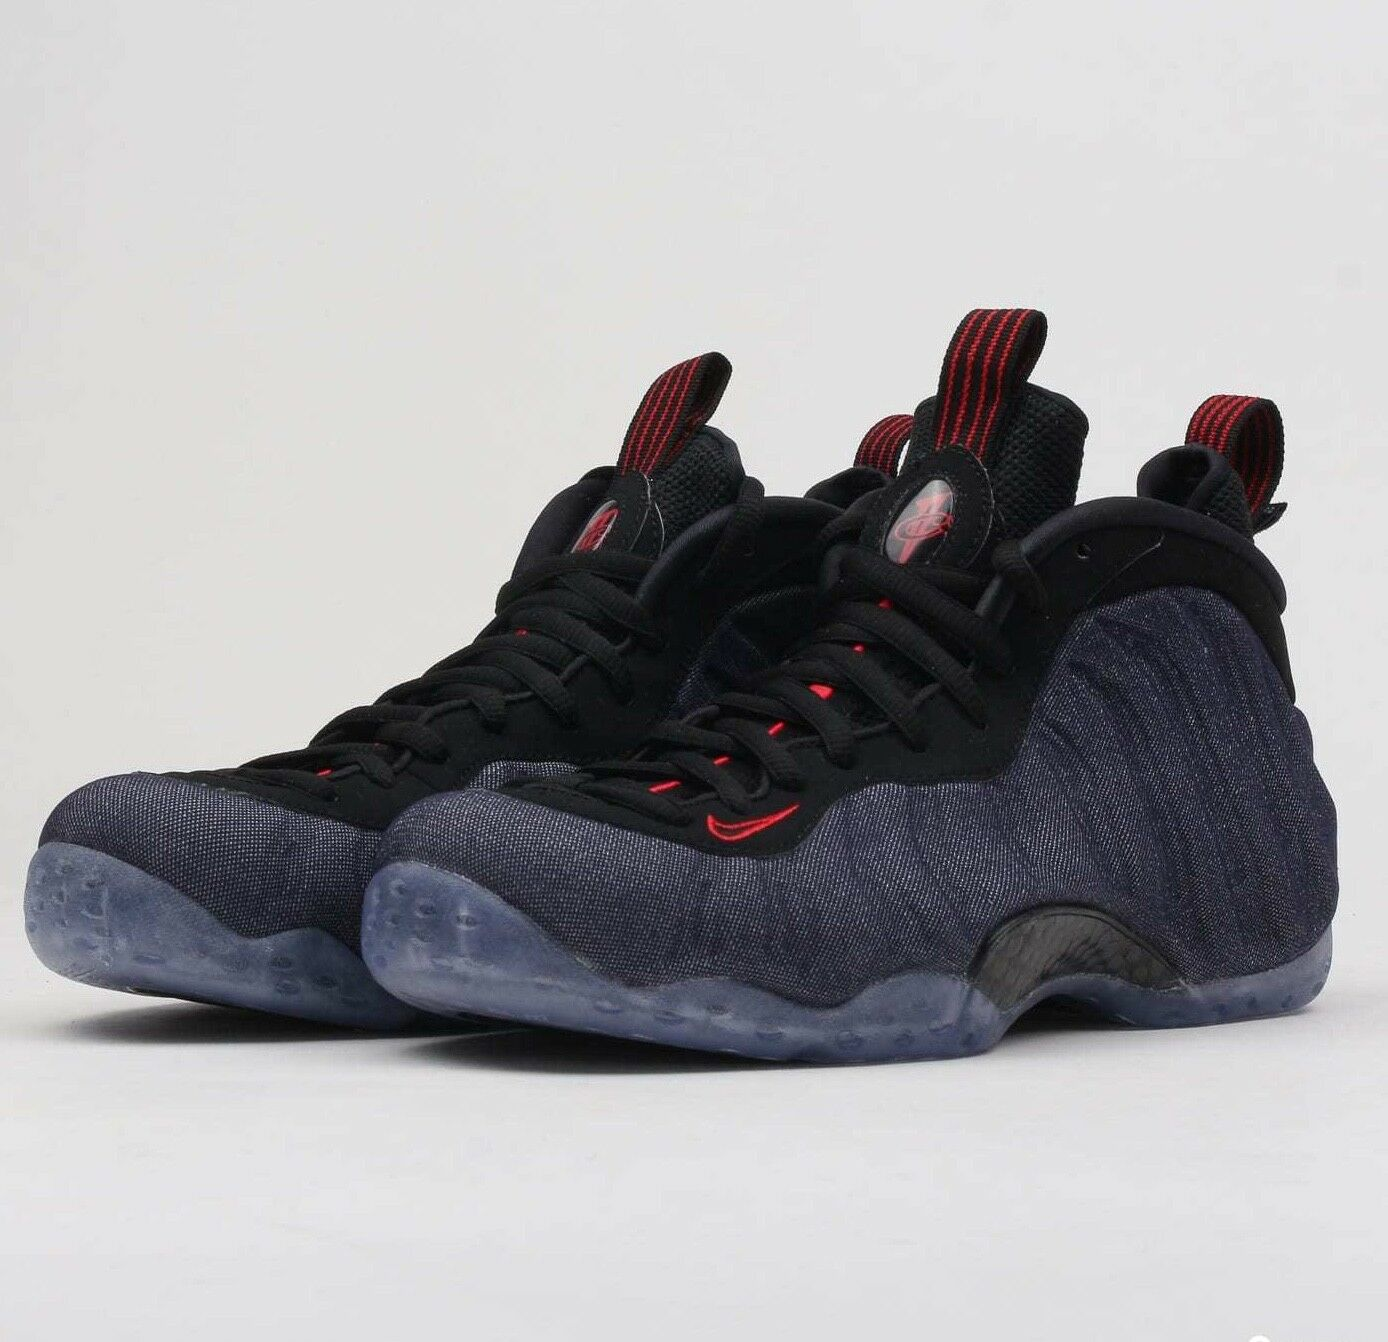 Nike Air Foamposite One Denim 314996-404 Obsidian Black Red Mens Basketball shoes